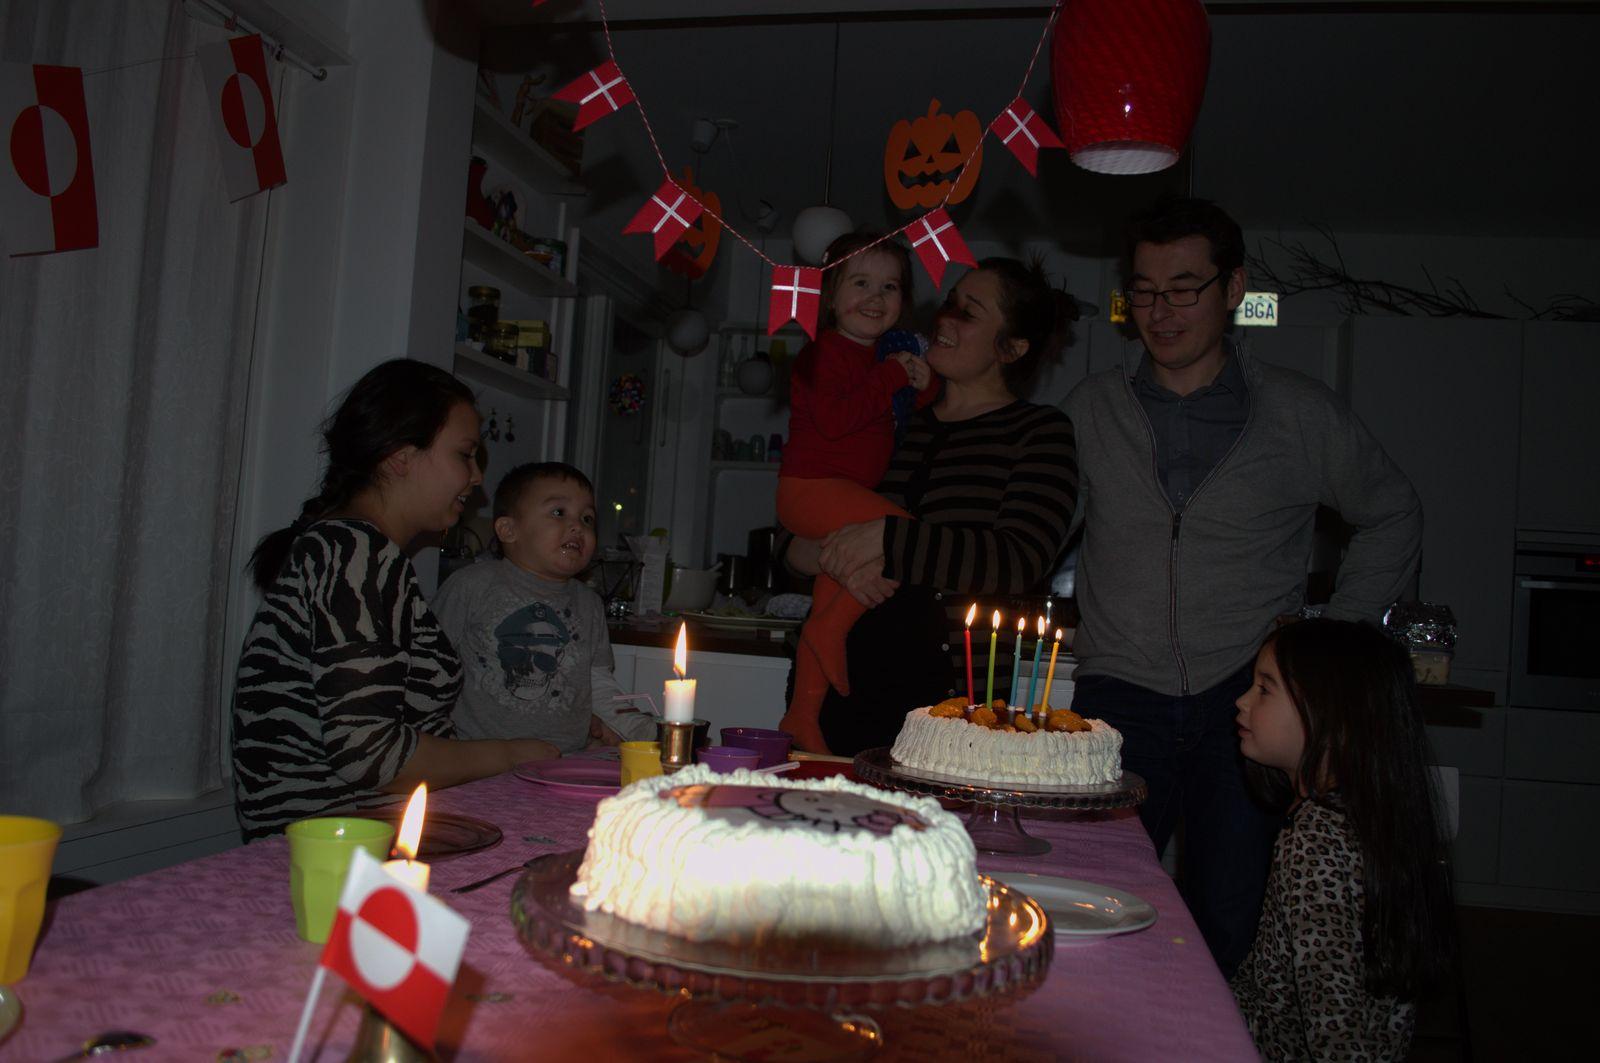 2013-11-12-1945_qupanuk_s_foedselsdag_elias_gode_1_jesper_eugenius_labansen_maritha_eugenius_labansen_naduk_steenholdt_qupanuk_eugen